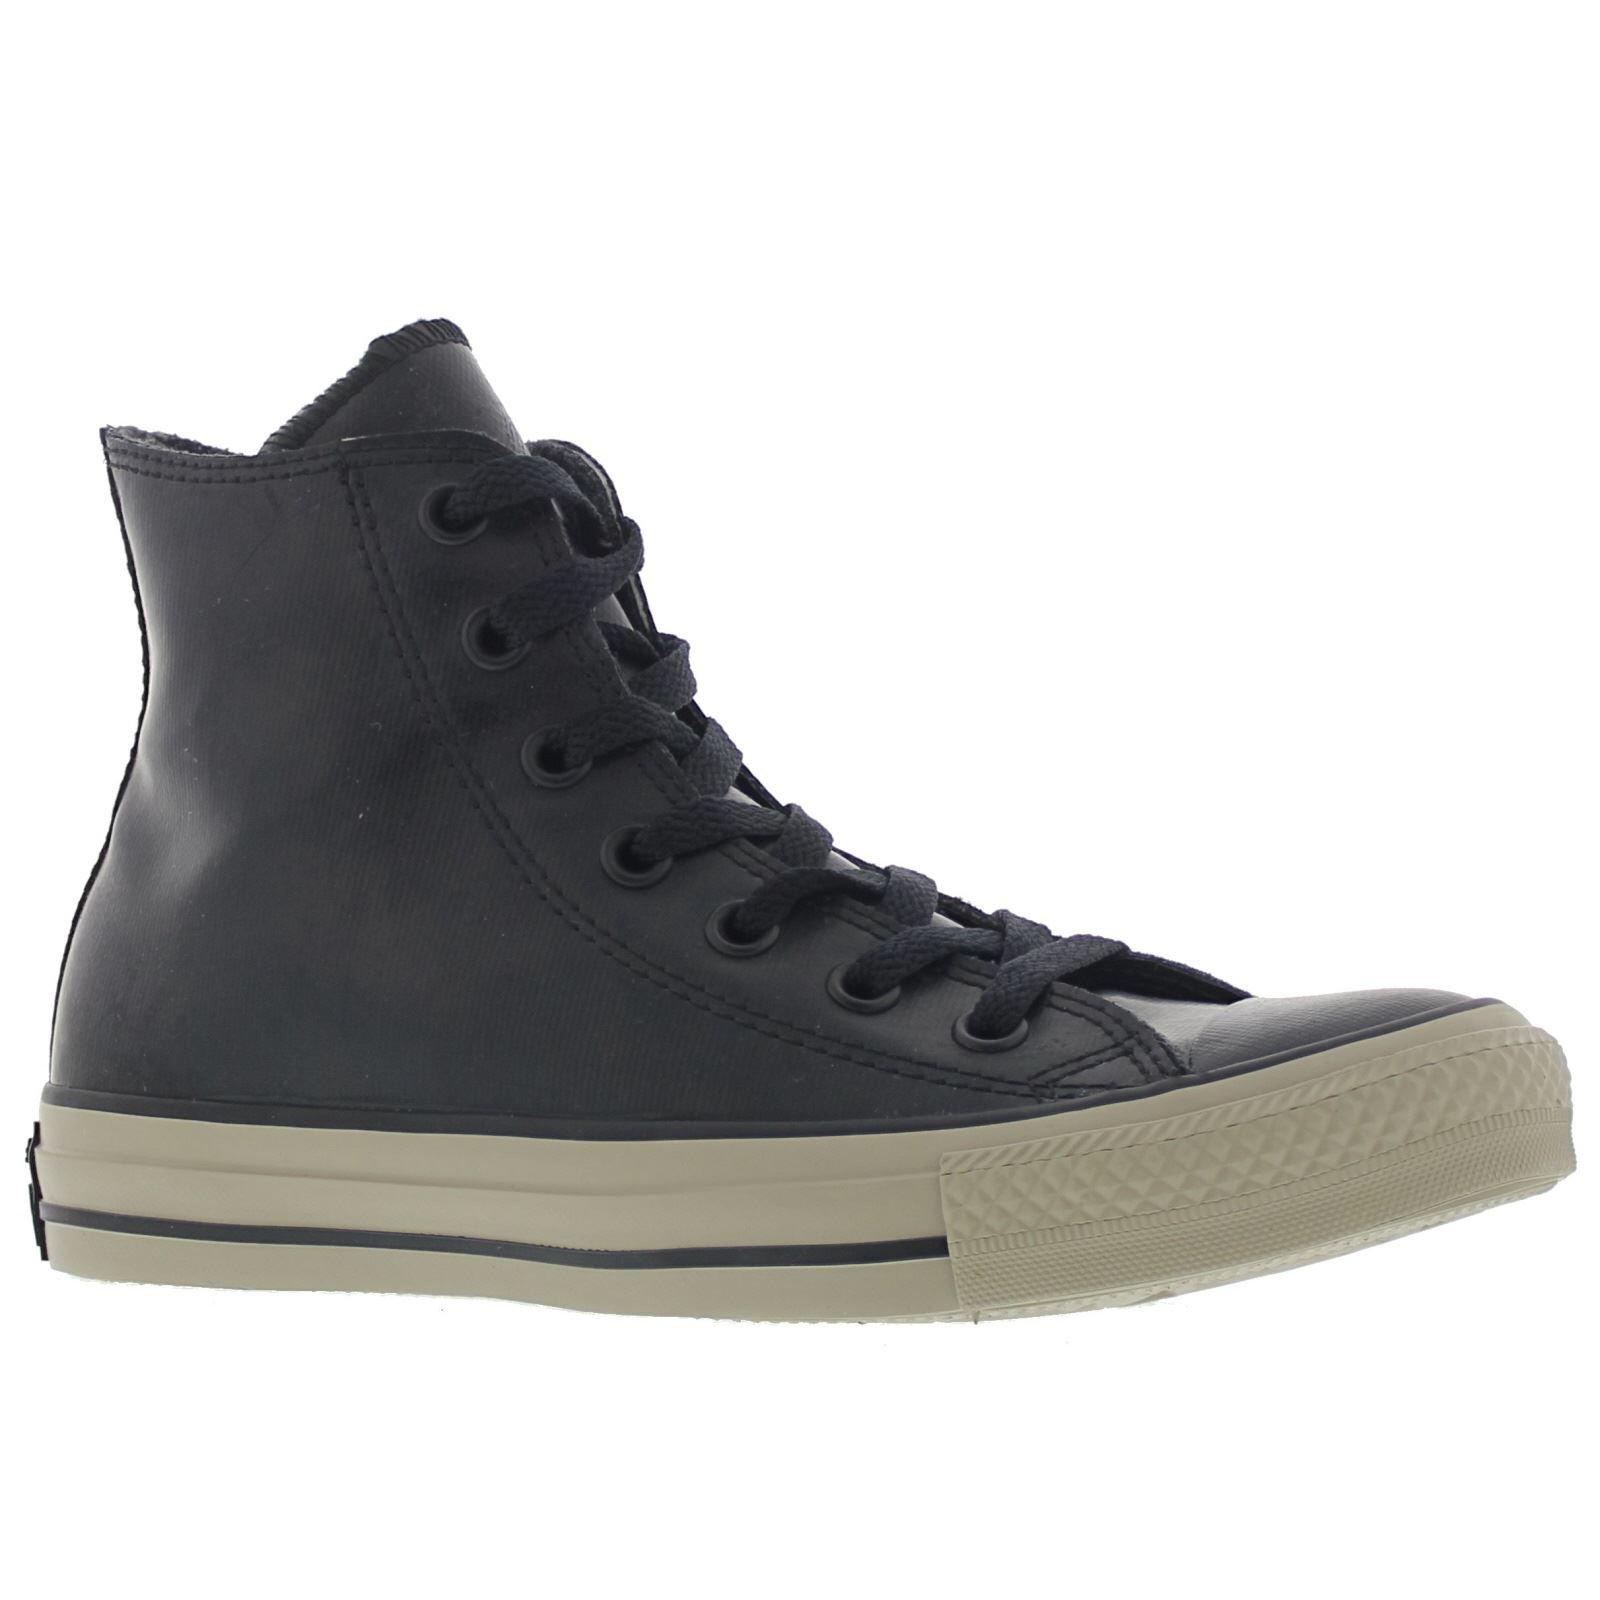 Converse Mens Chuck Taylor All Star Rubber Black Sneaker 4 Men 6 Women